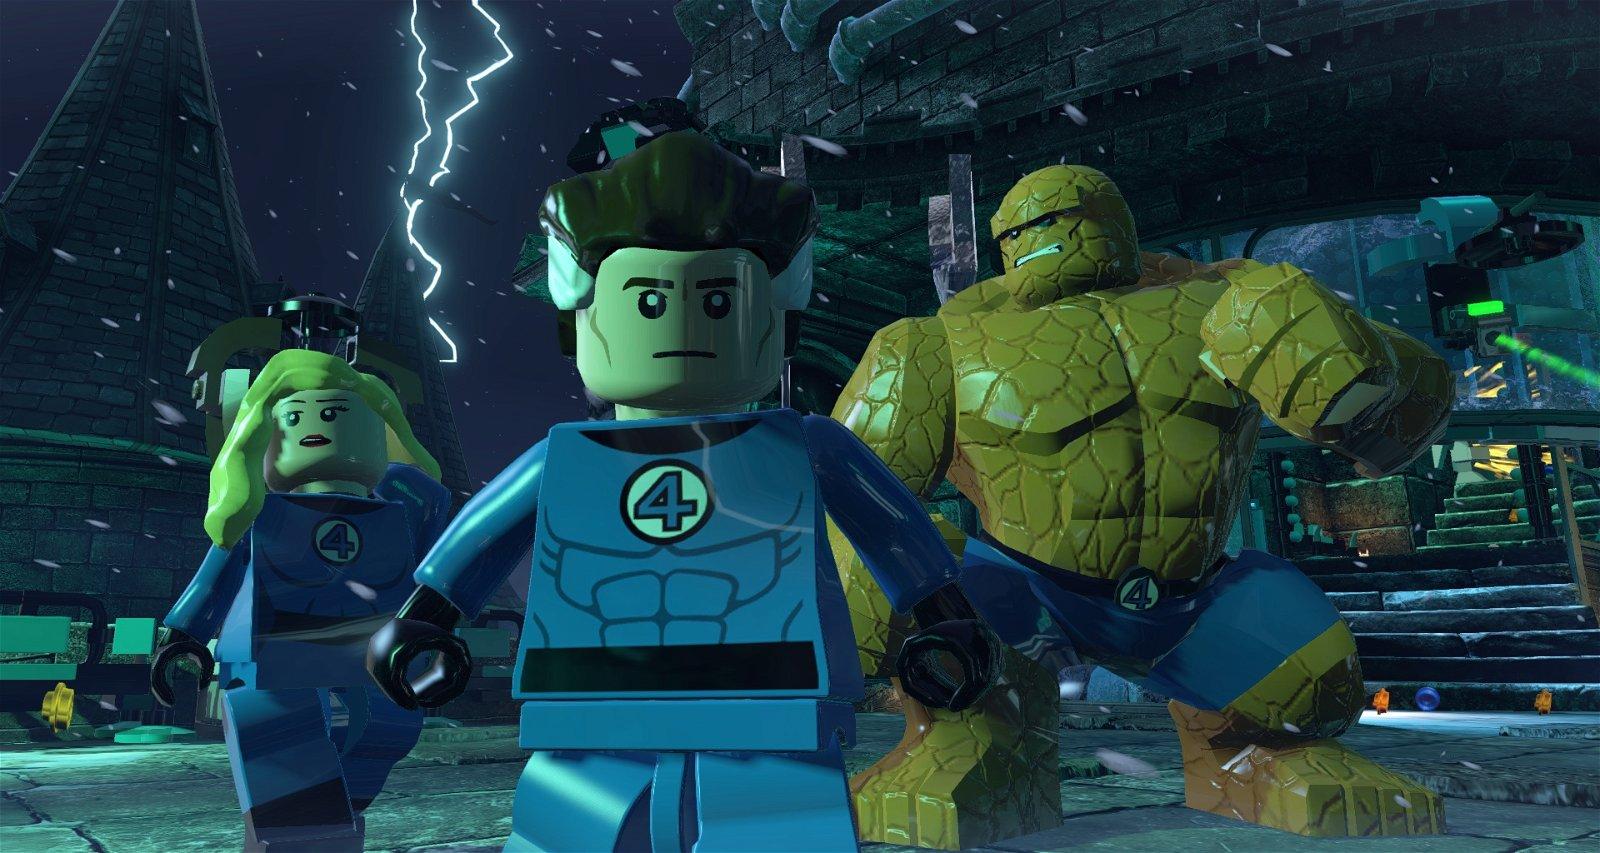 Legomarvelinsert2